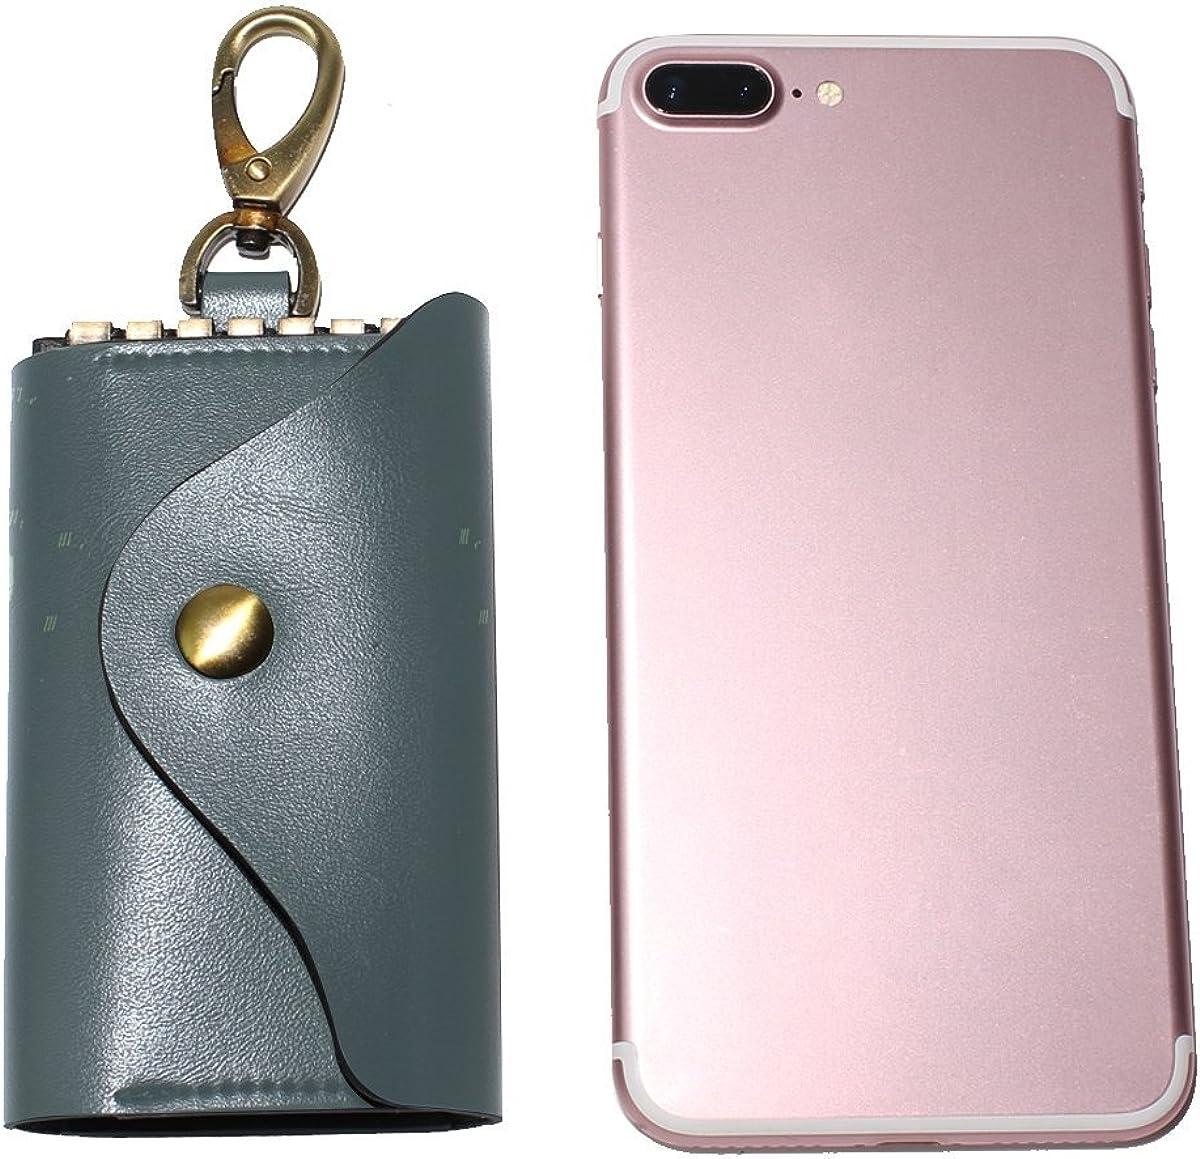 DEYYA Retro Deer Head Leather Key Case Wallets Unisex Keychain Key Holder with 6 Hooks Snap Closure